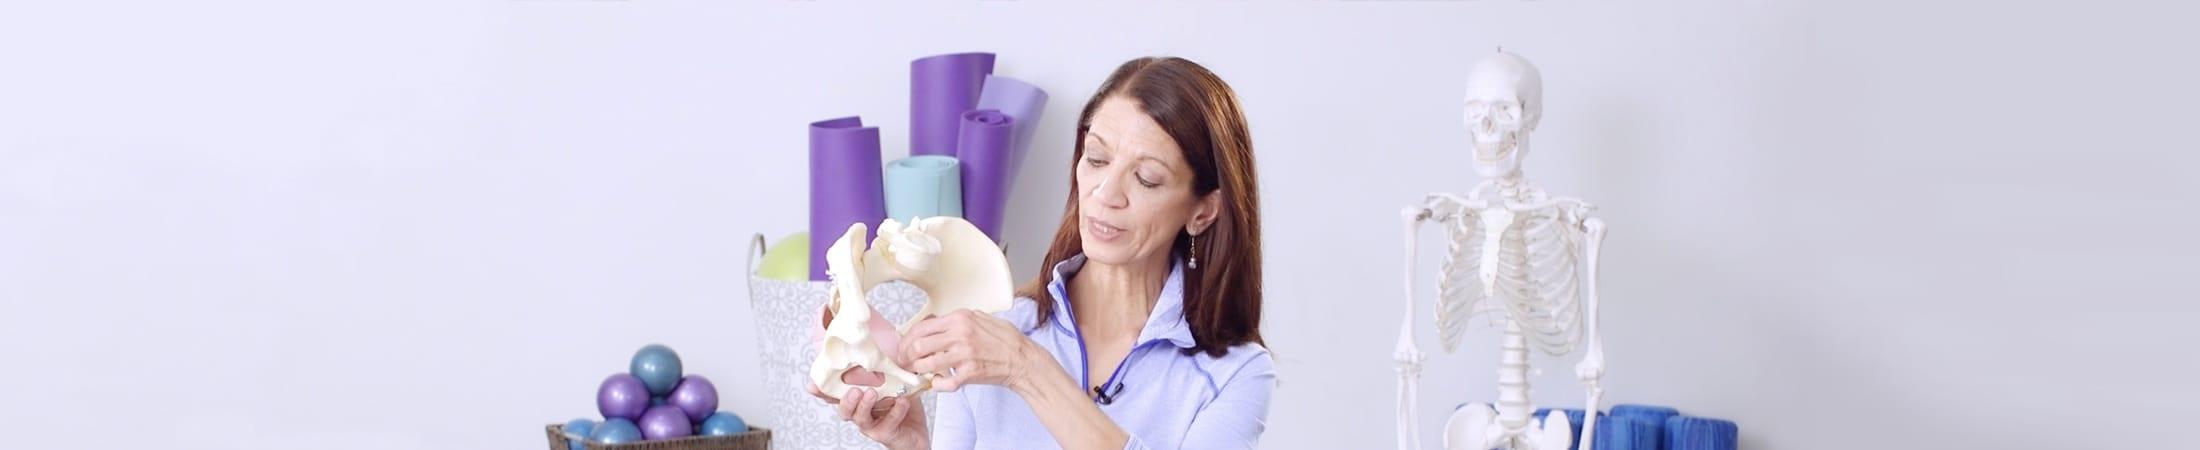 Carolyne Anthony explaining the anatomy of a female pelvis during the Pelvic Floor health course